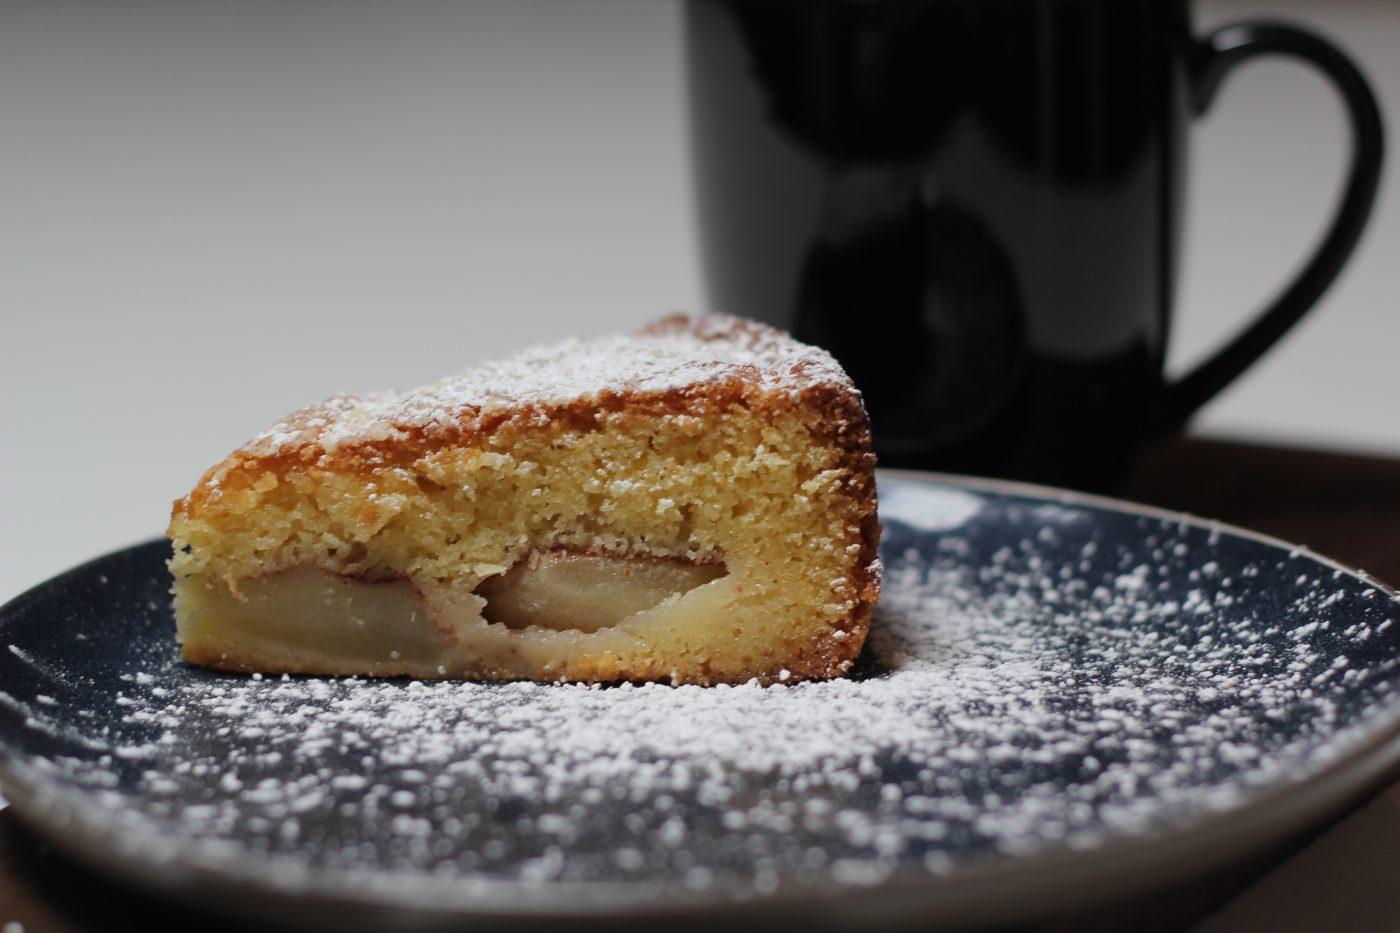 Mama S Cake Recipe Italian: Italy Inspired Plum And Pear Cake